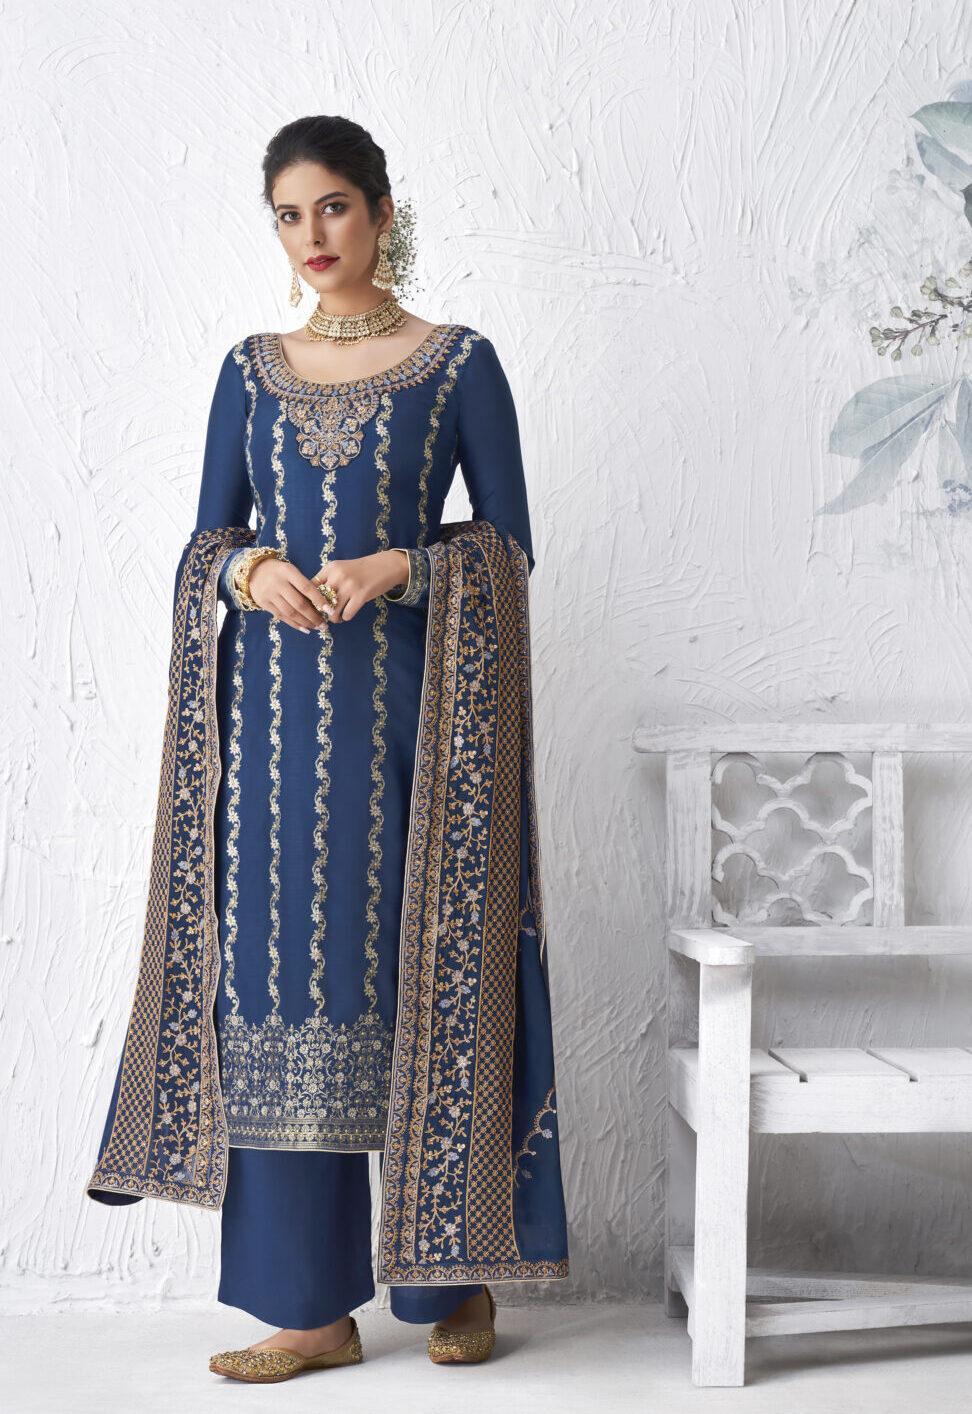 Navy Blue Bridal Punjabi Suit with Price